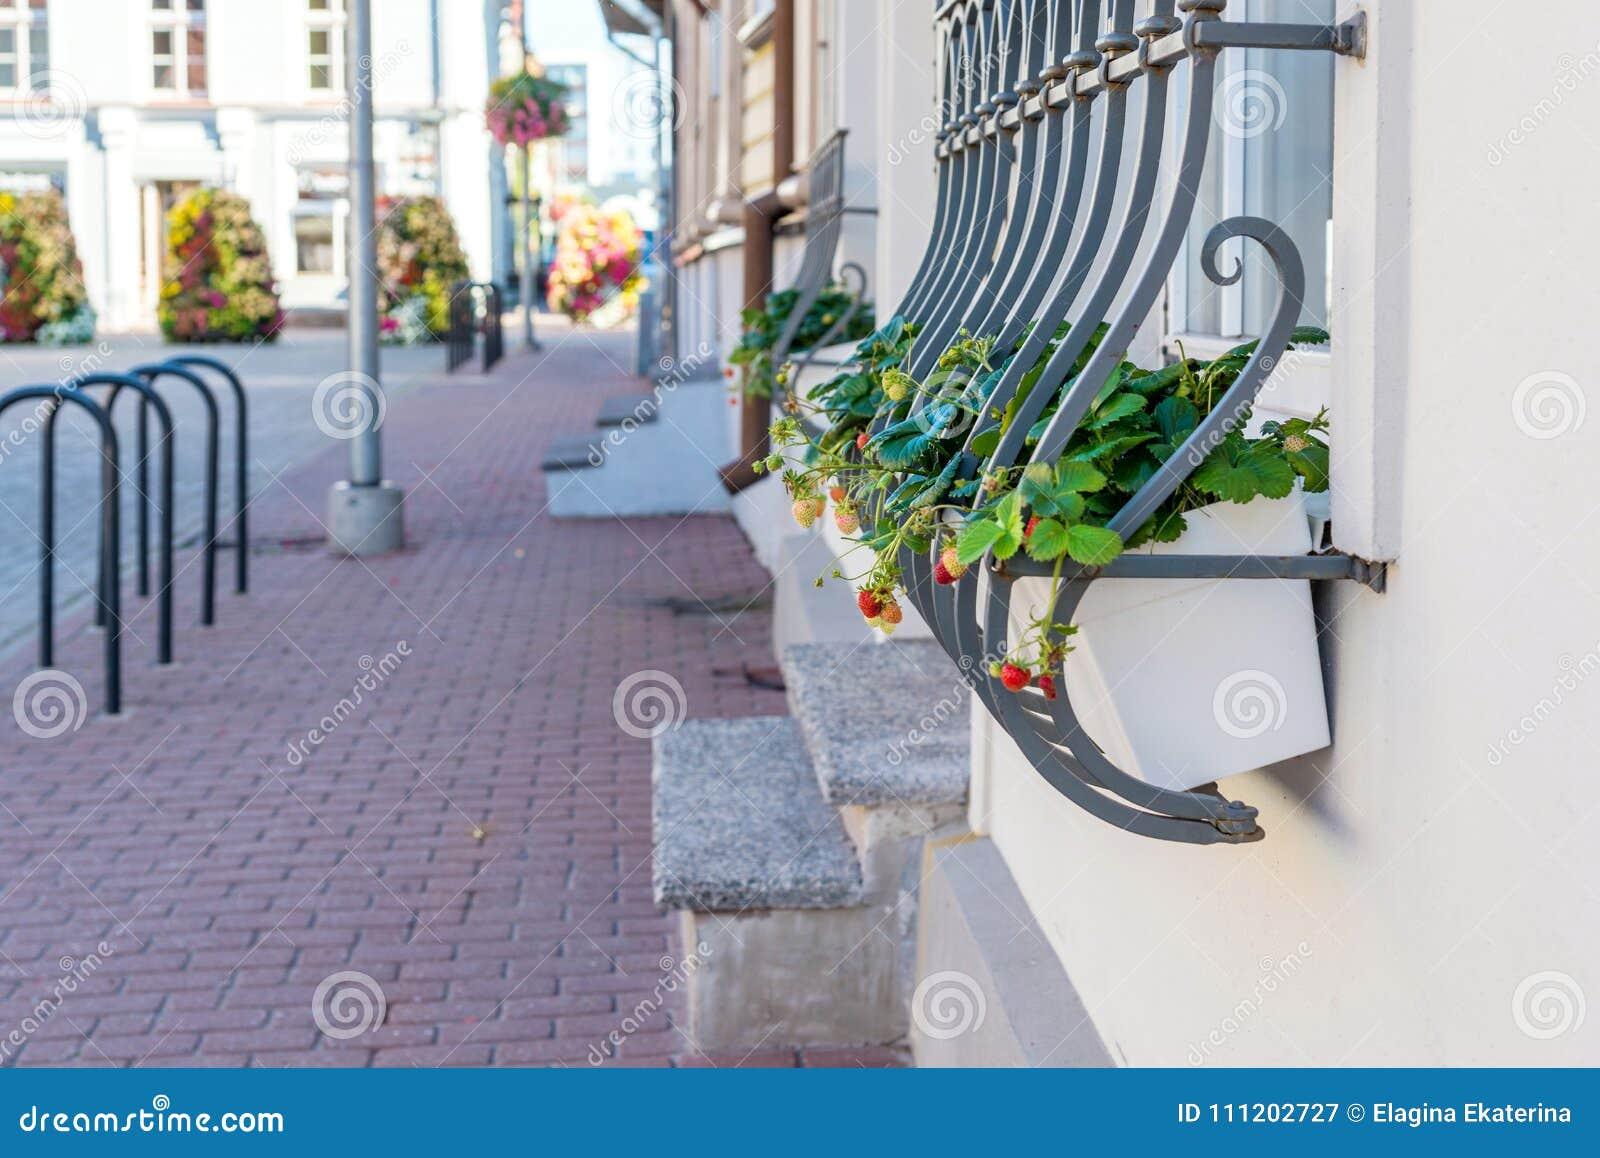 Strawberry in flowerpot on the street. window decoration